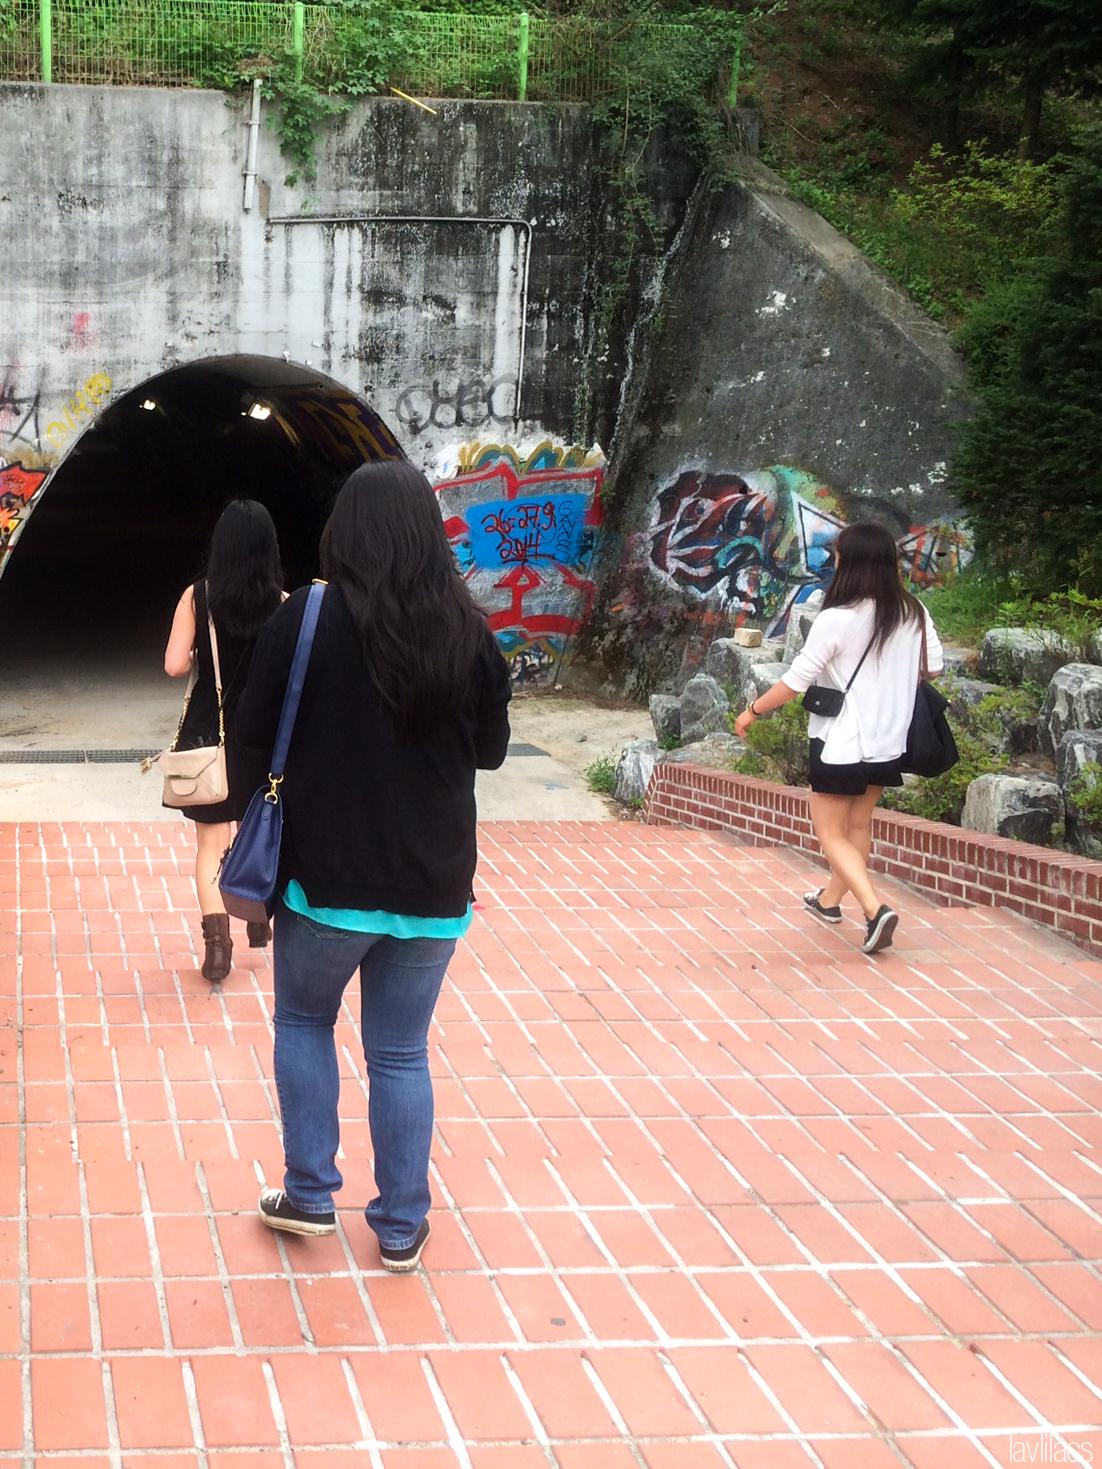 Seoul, Korea - Summer Study Abroad 2014 - Sinchon Edae Graffiti Tunnel entering